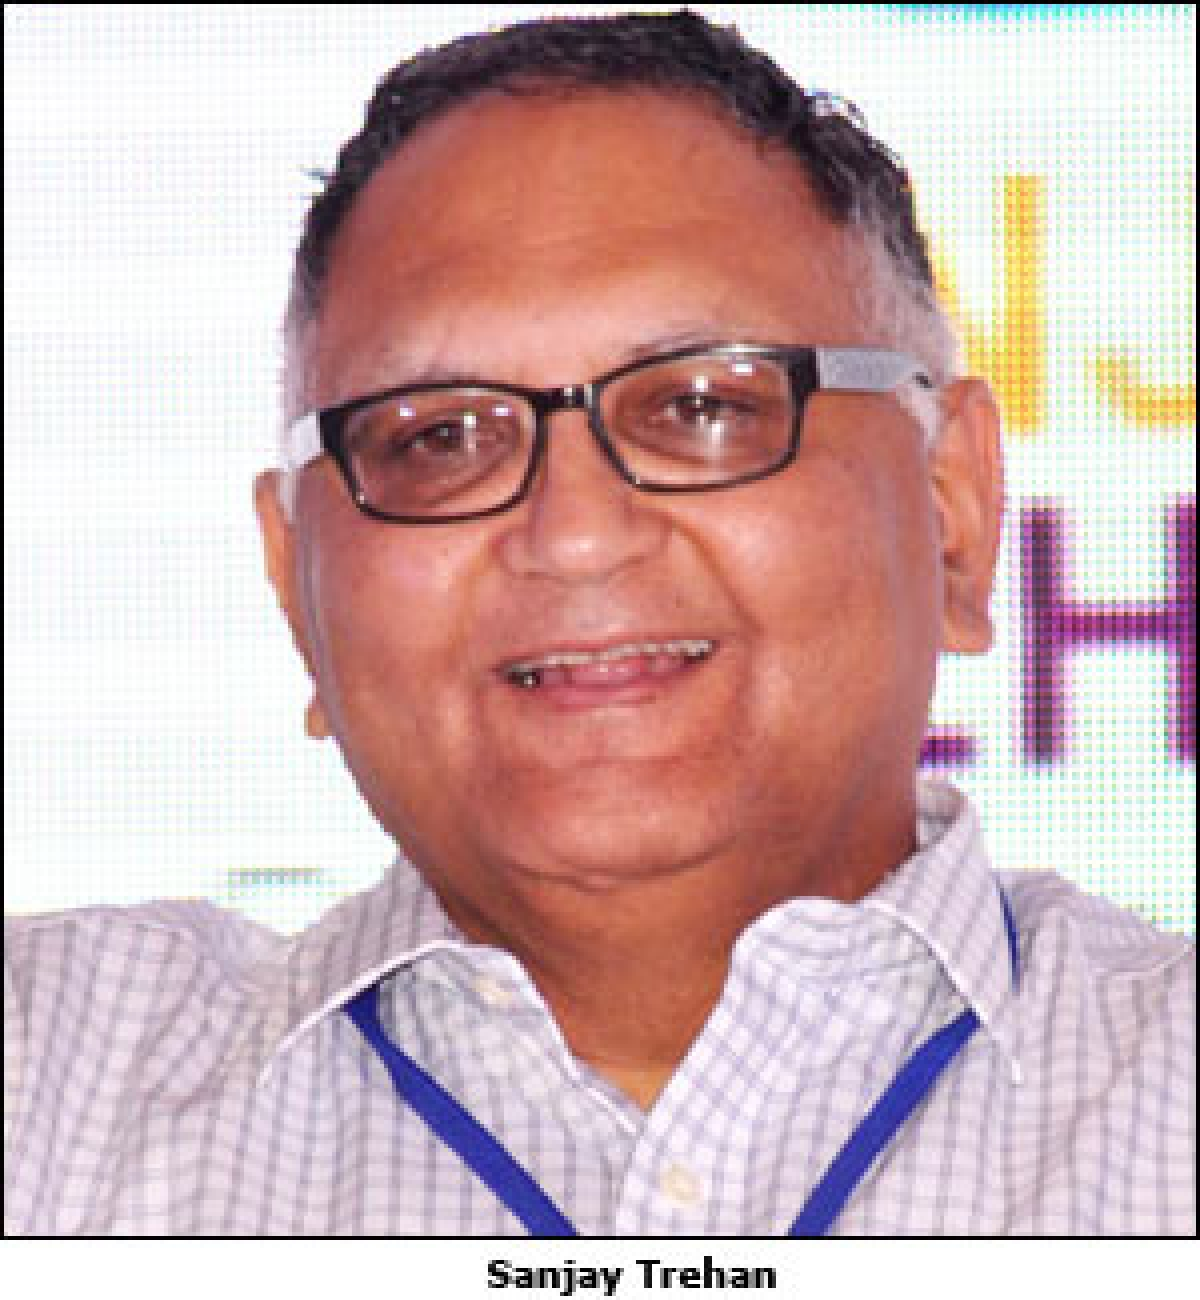 """Big data is a self-fulfilling prophecy"" - Sanjay Trehan, Hindustan Times Digital"